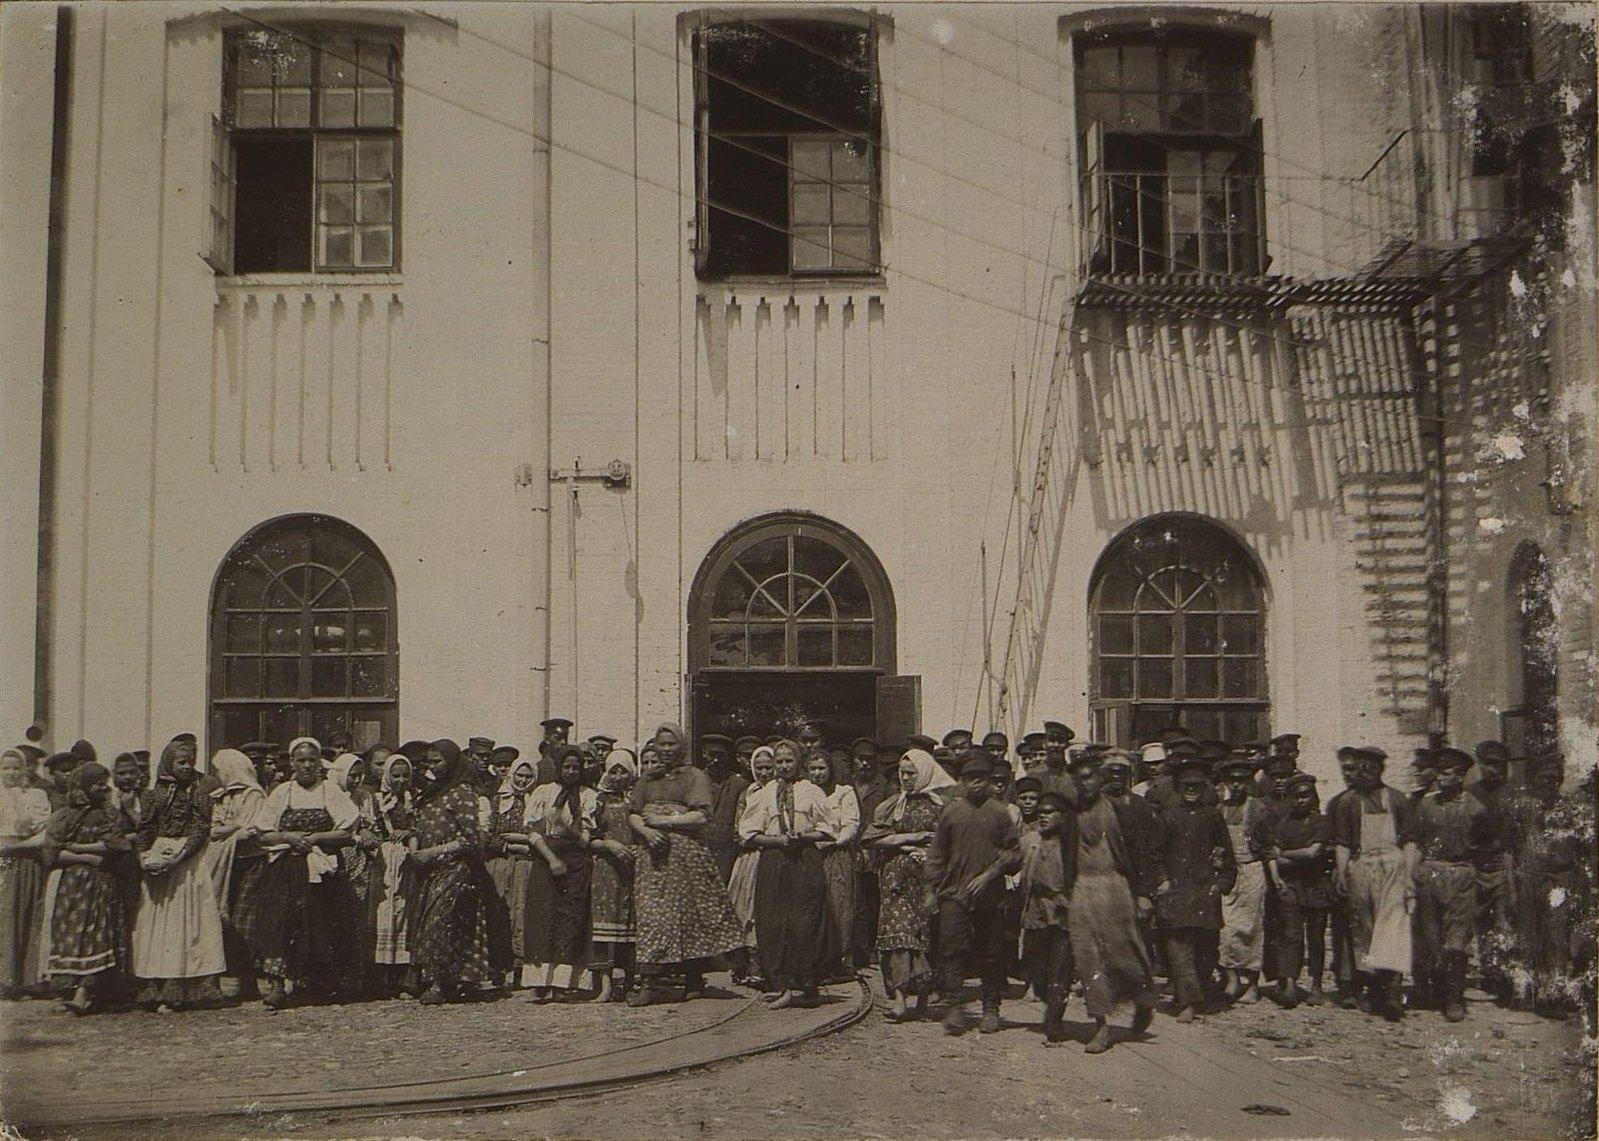 03. Рабочие и служащие во дворе фабрики